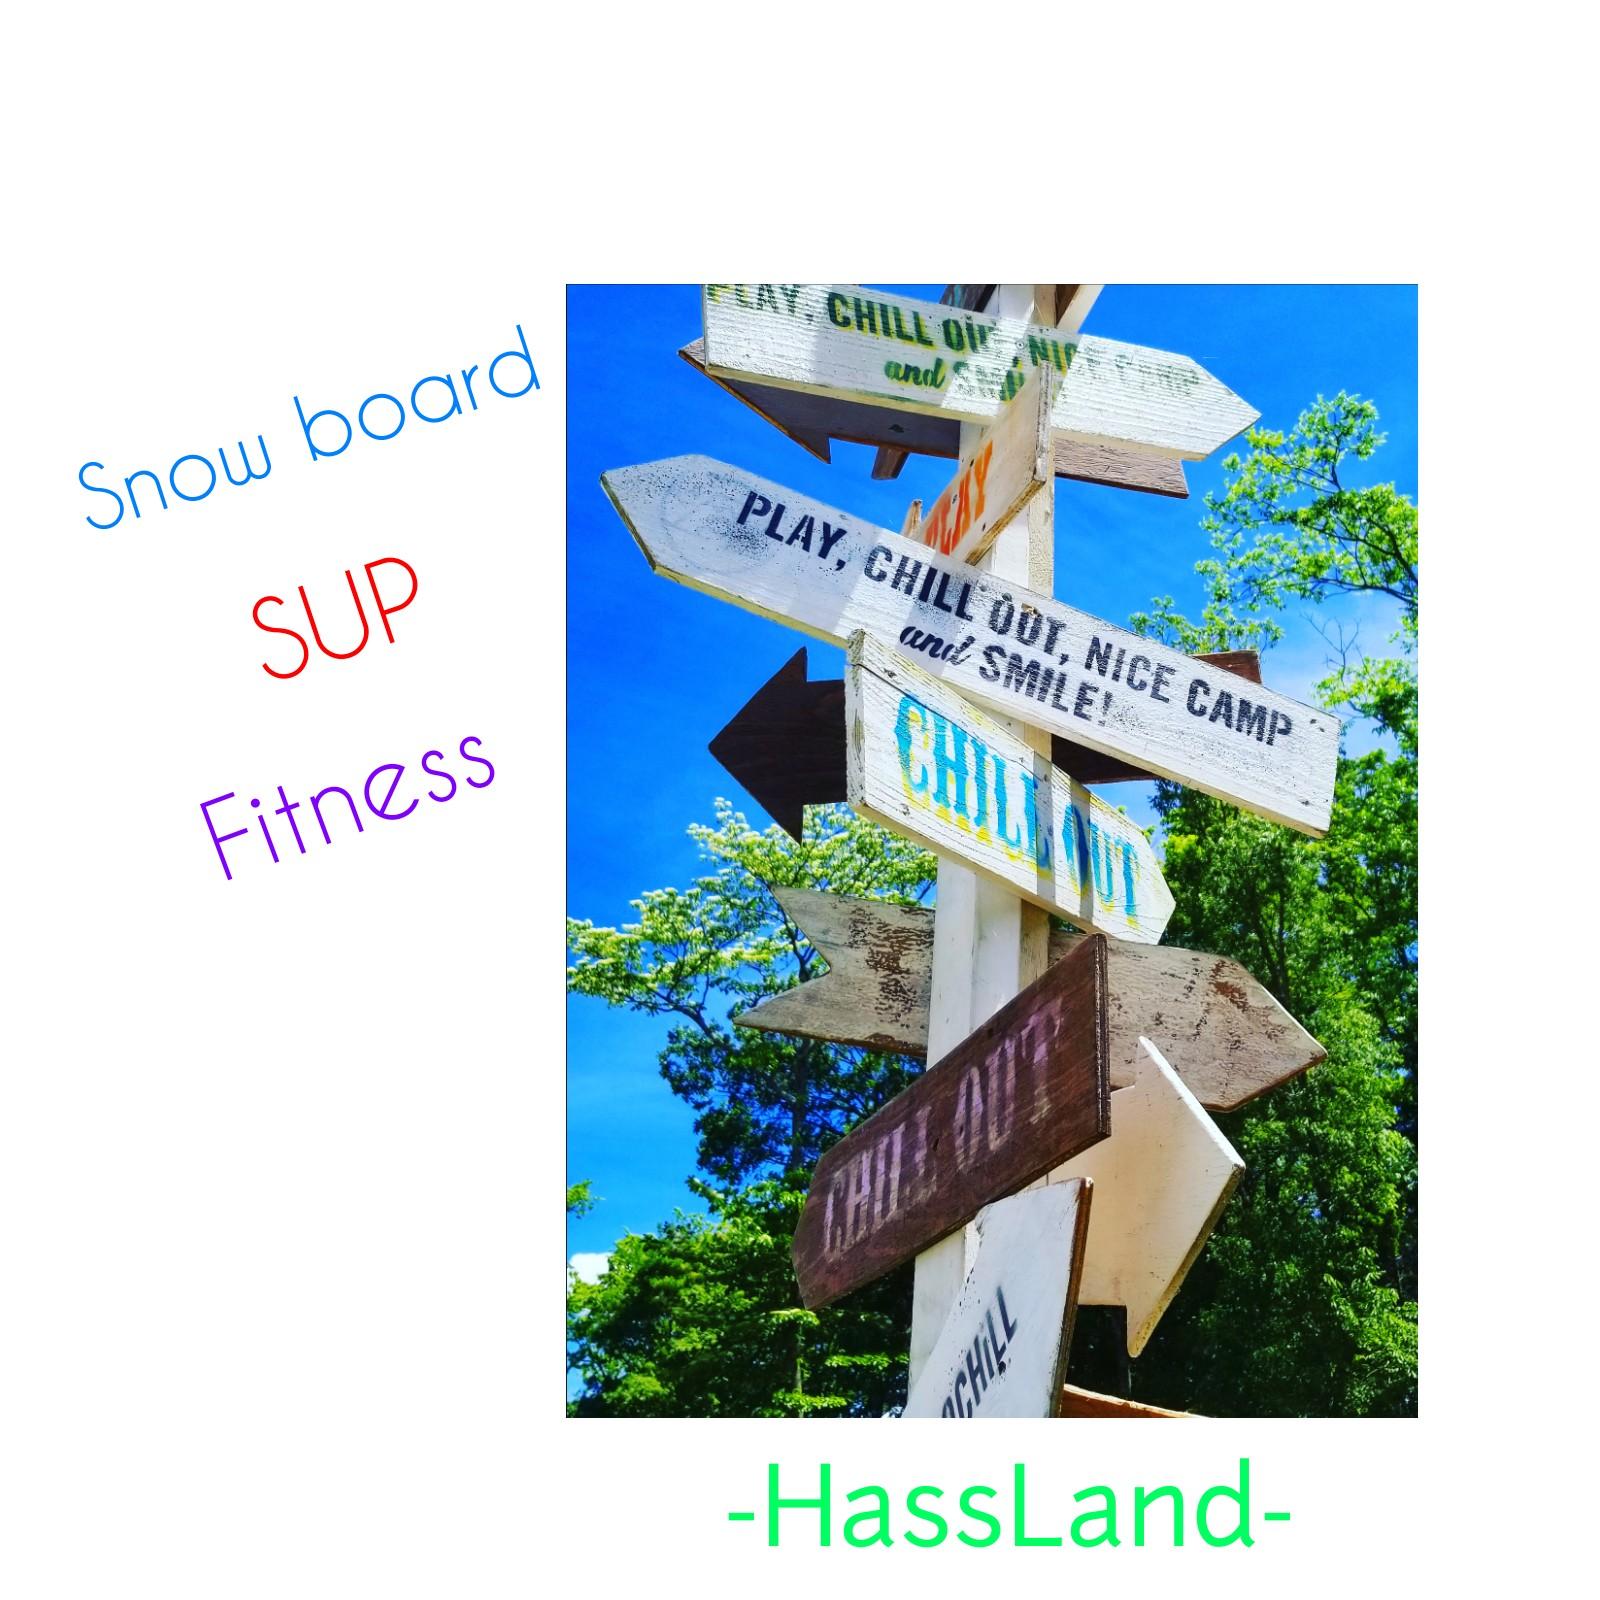 HassLand